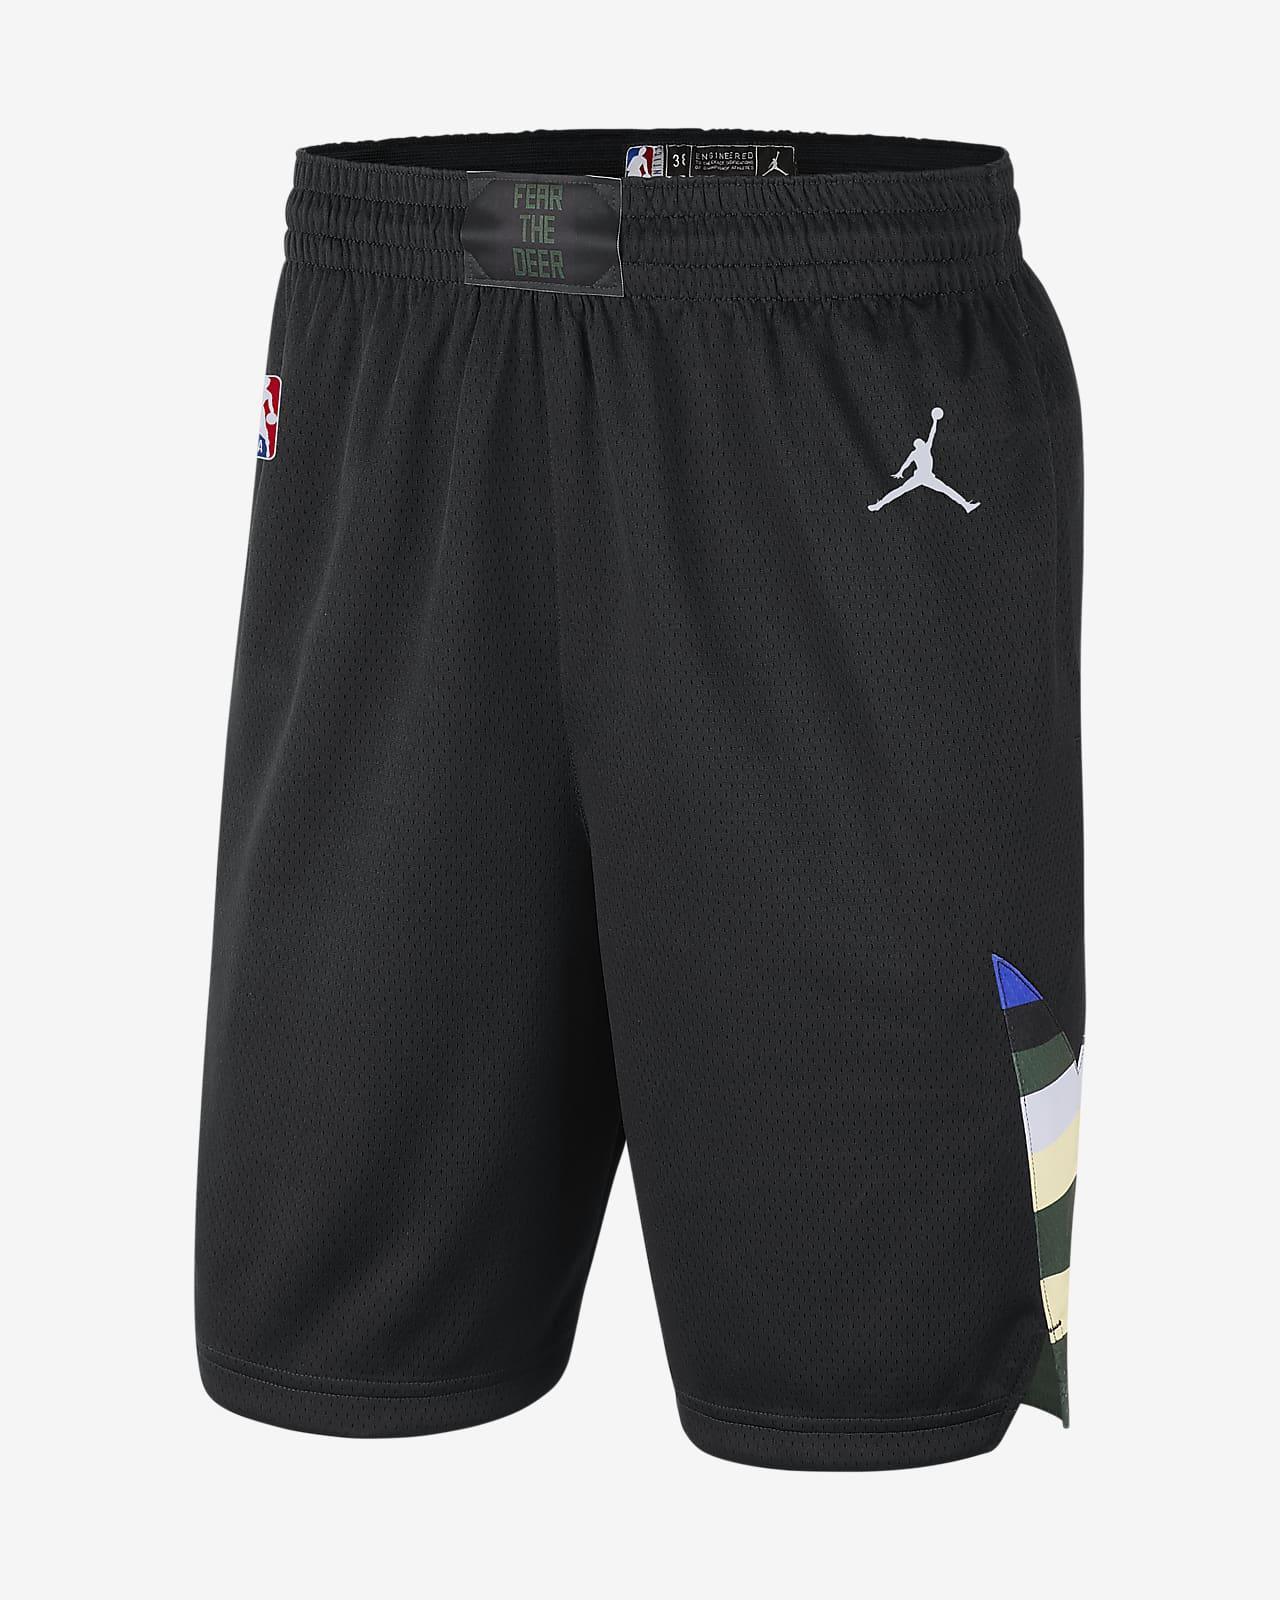 Calções NBA da Jordan Swingman Bucks Statement Edition 2020 para homem